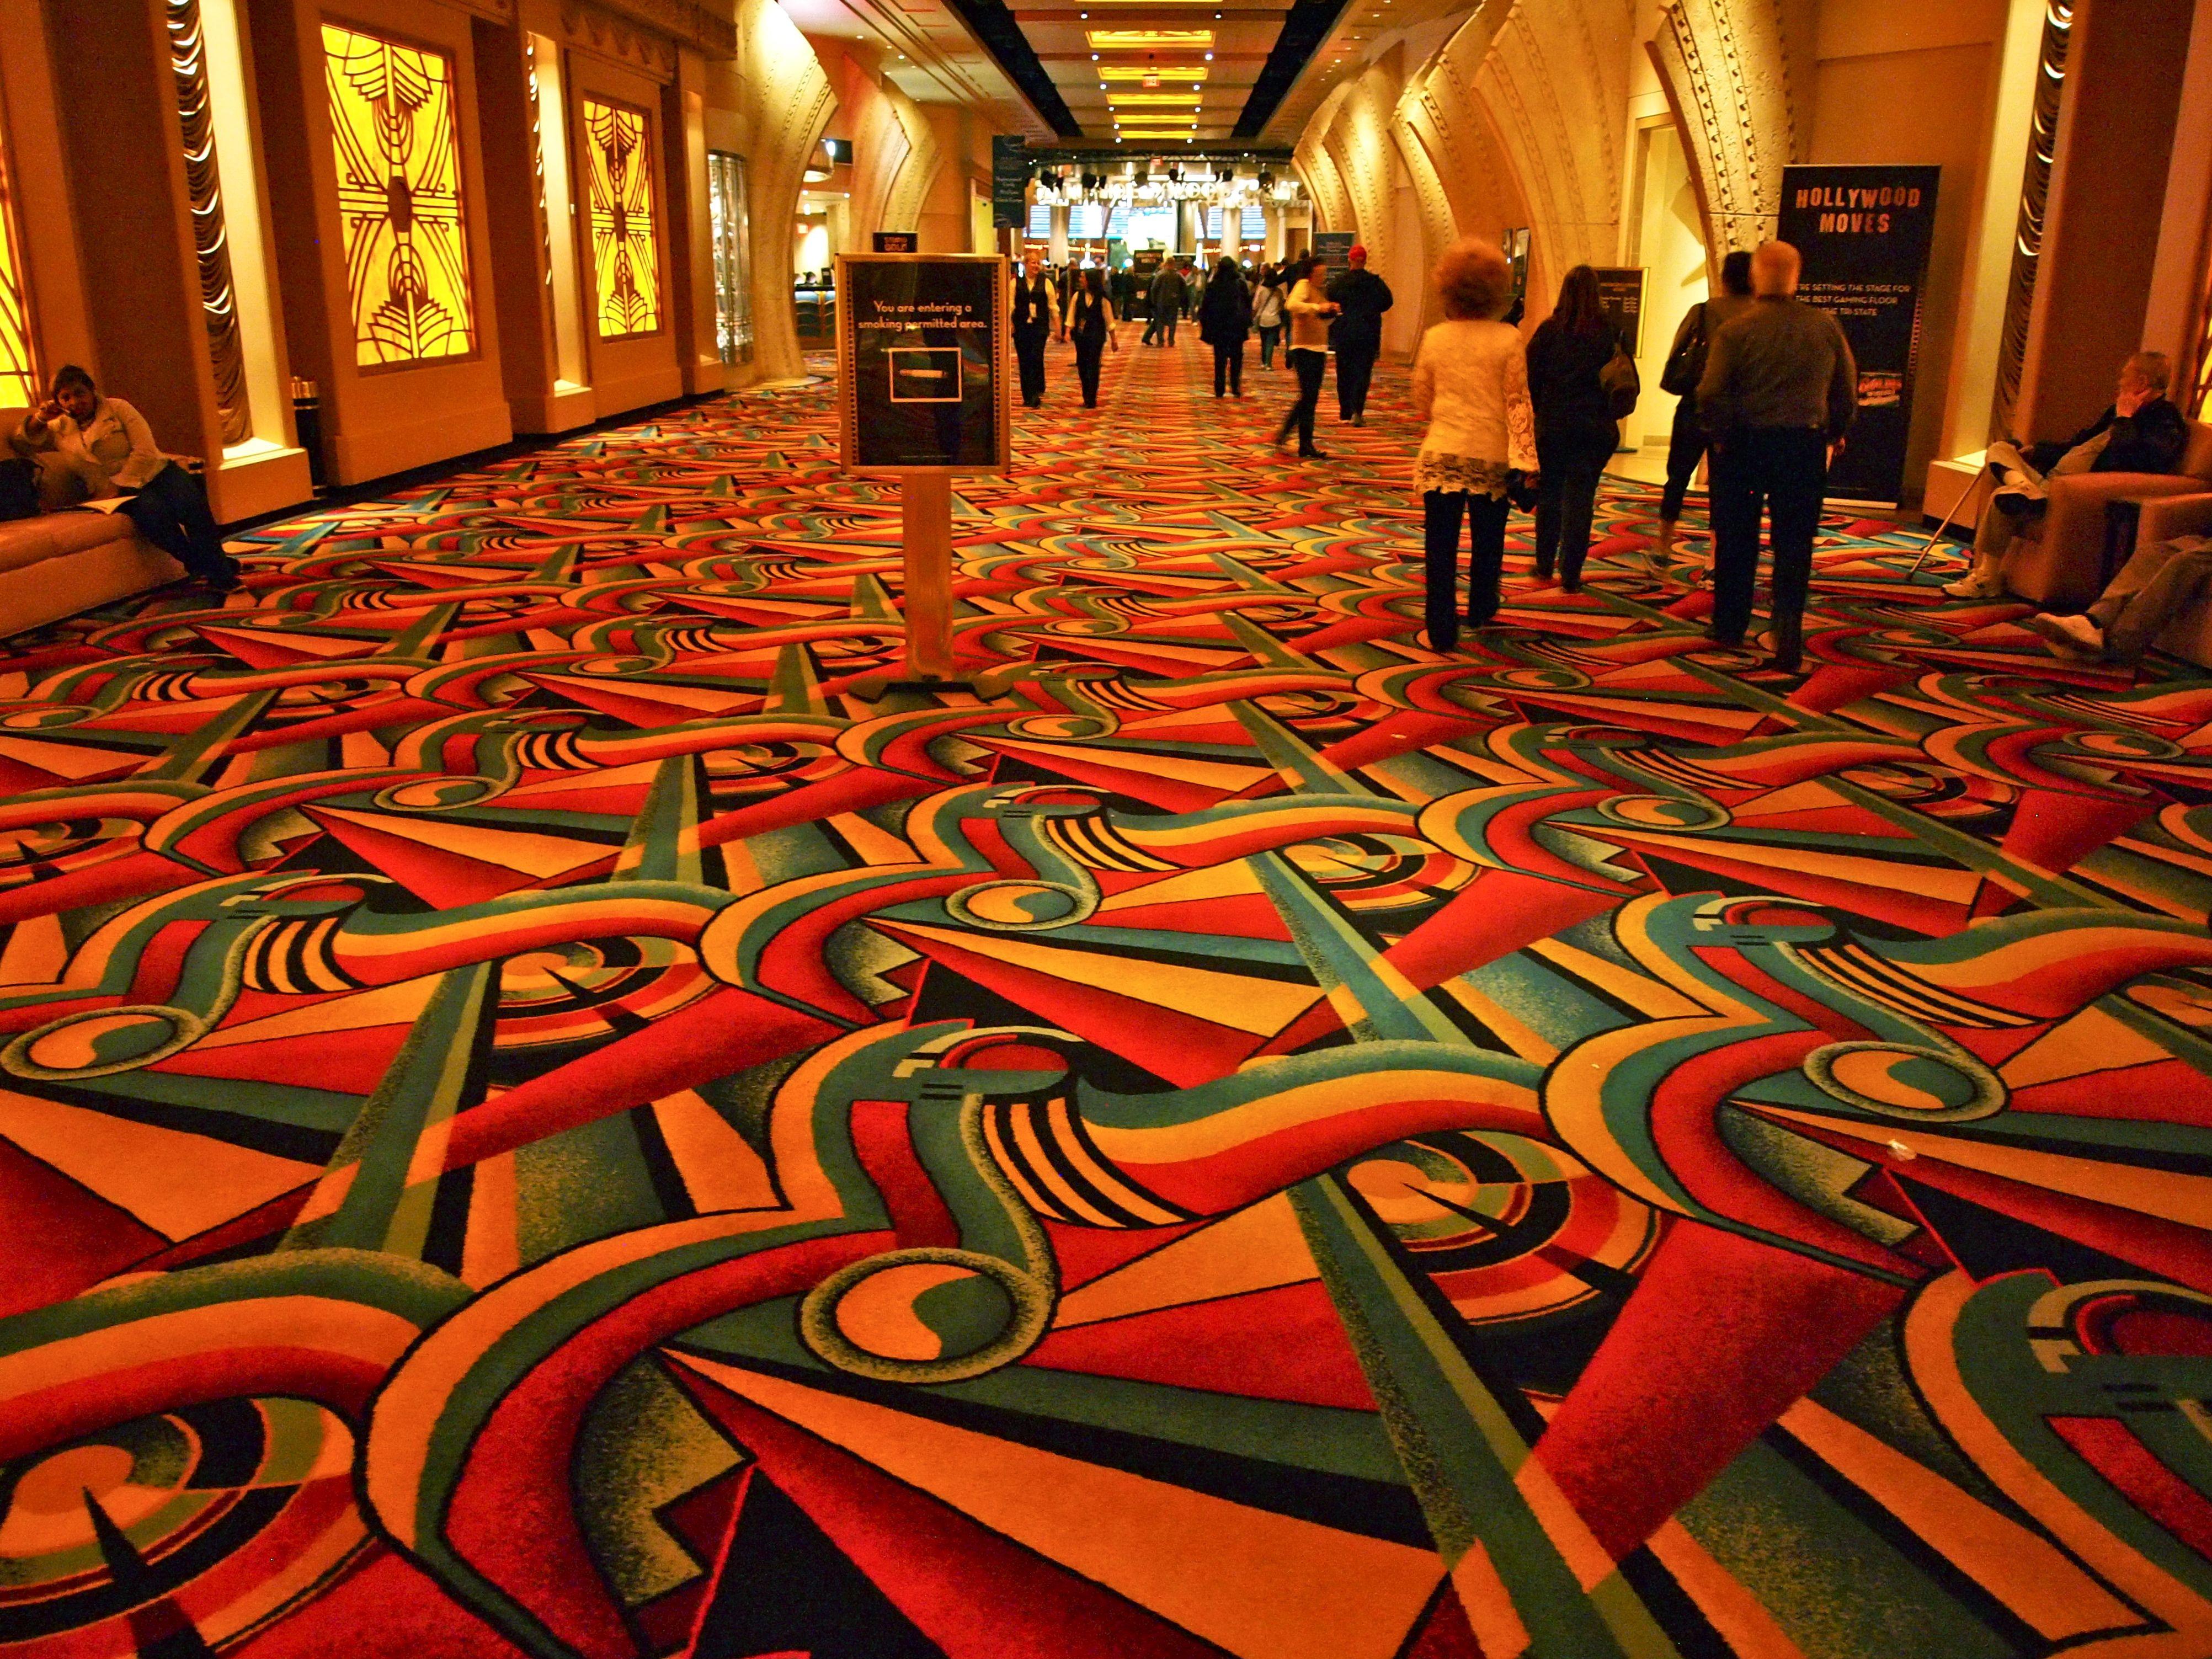 Carpet carpeting casino golden casino wiki